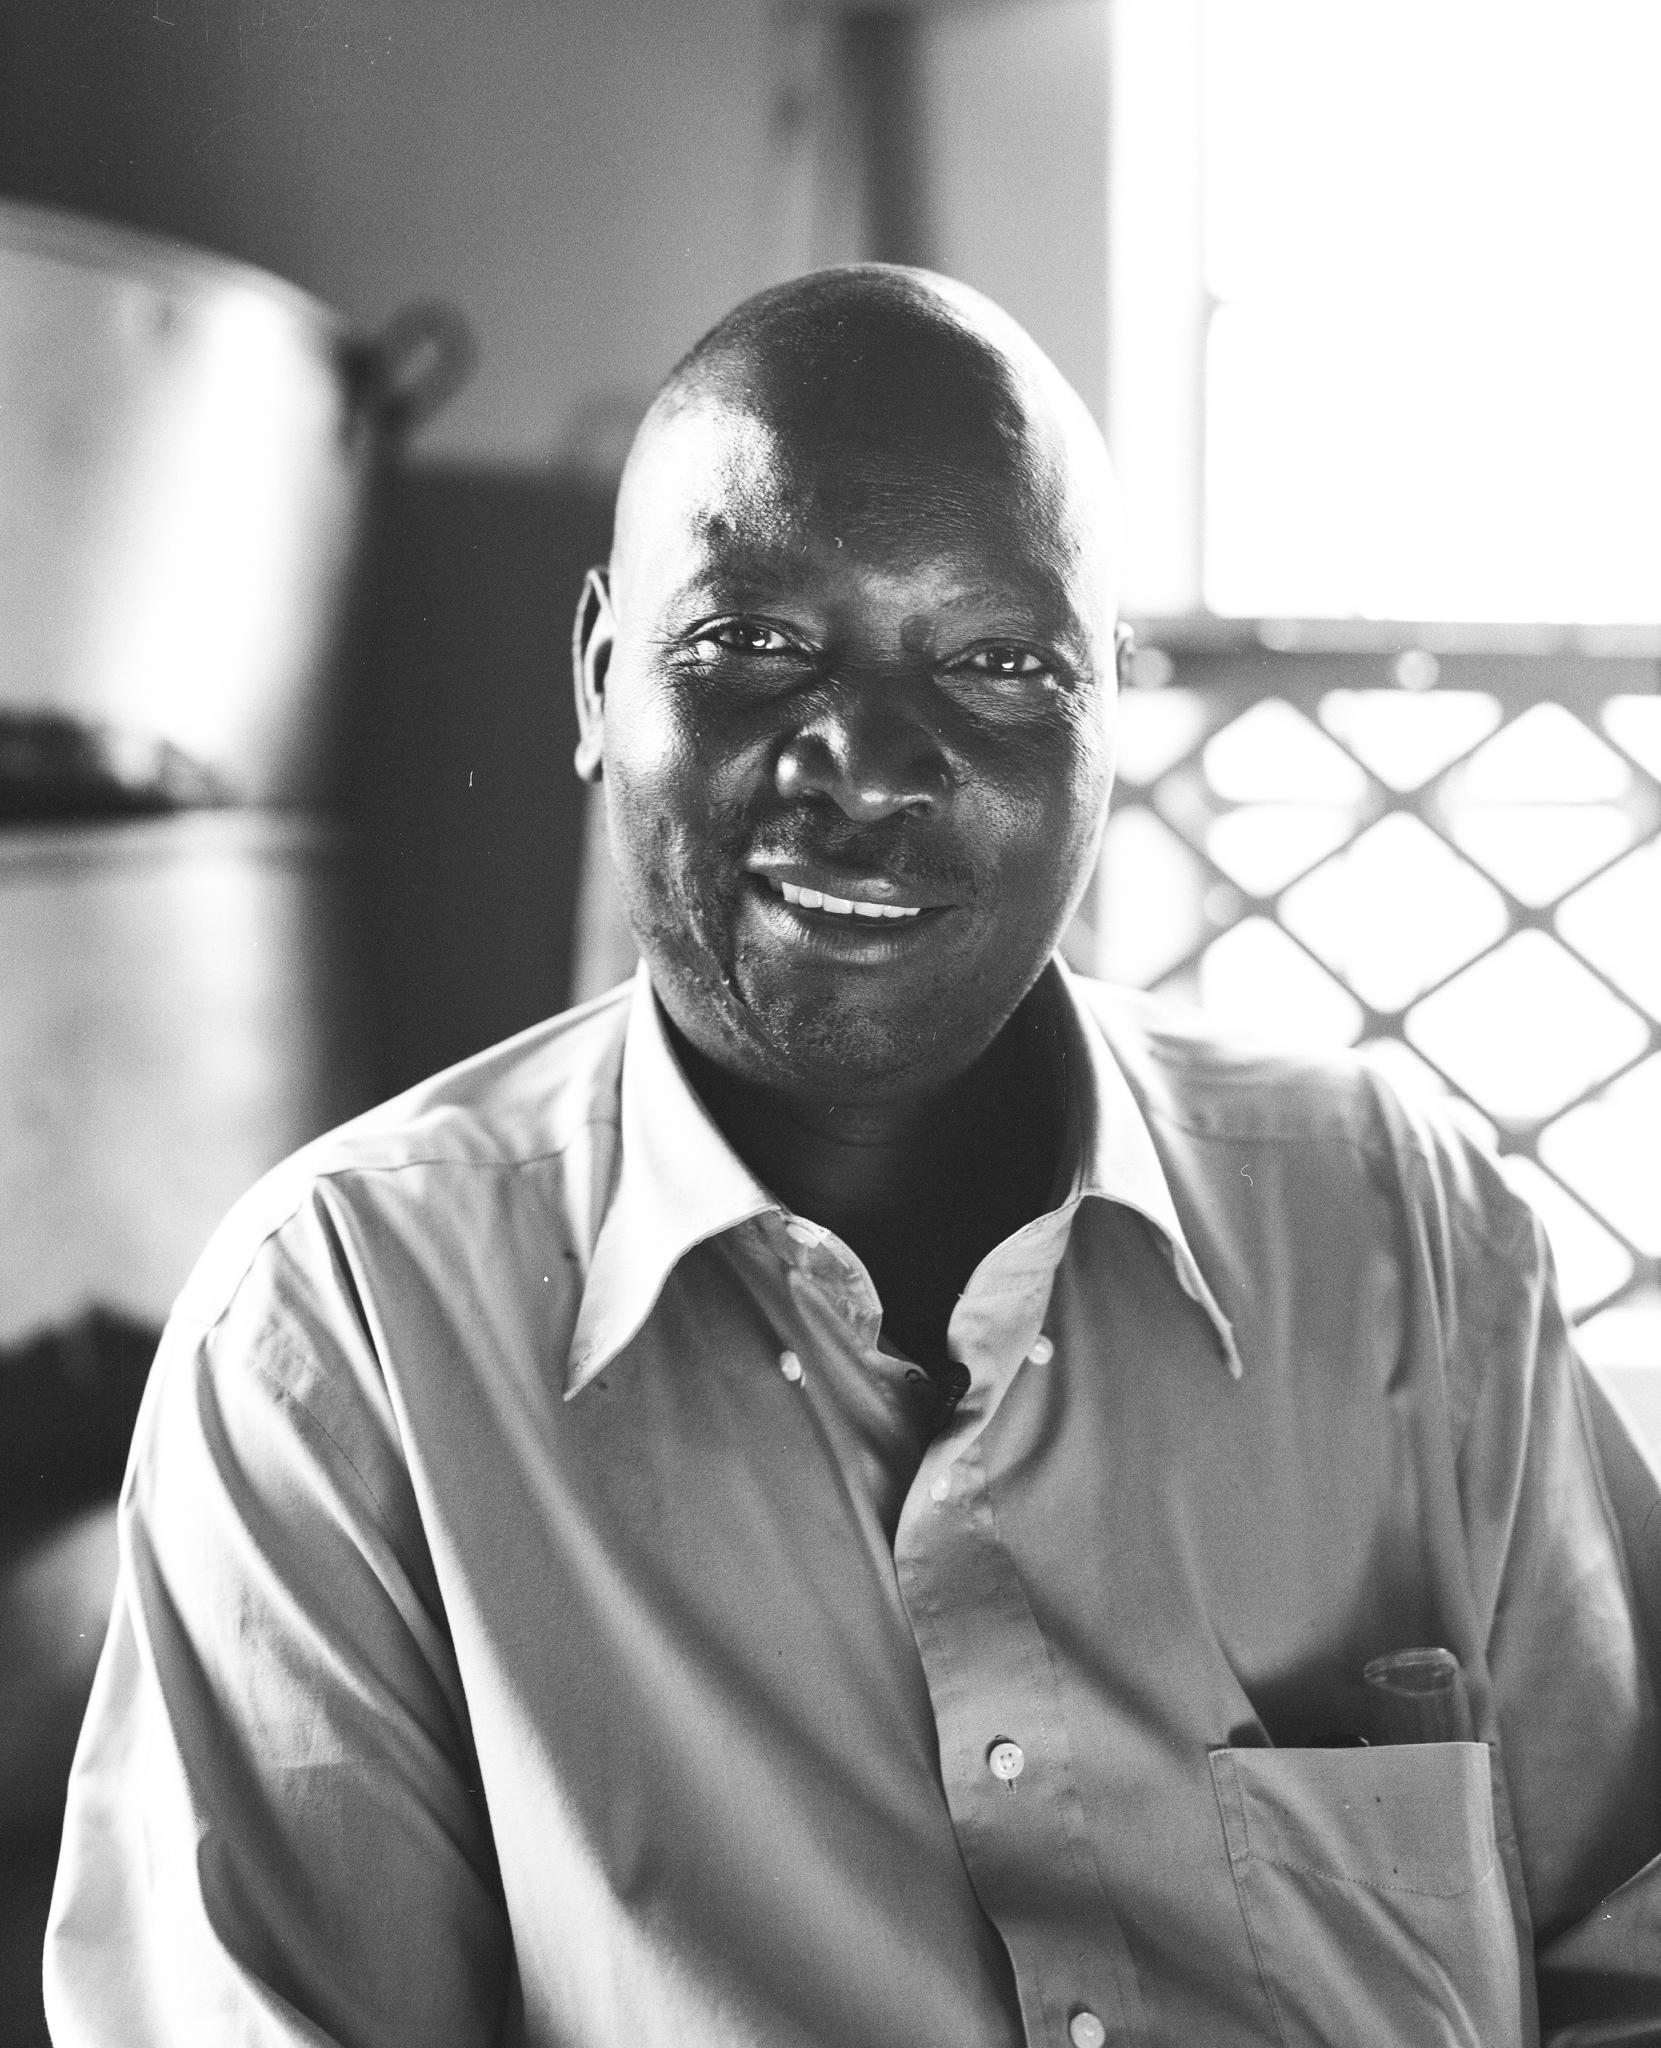 Mr Kiverson Savah, Director & Founder